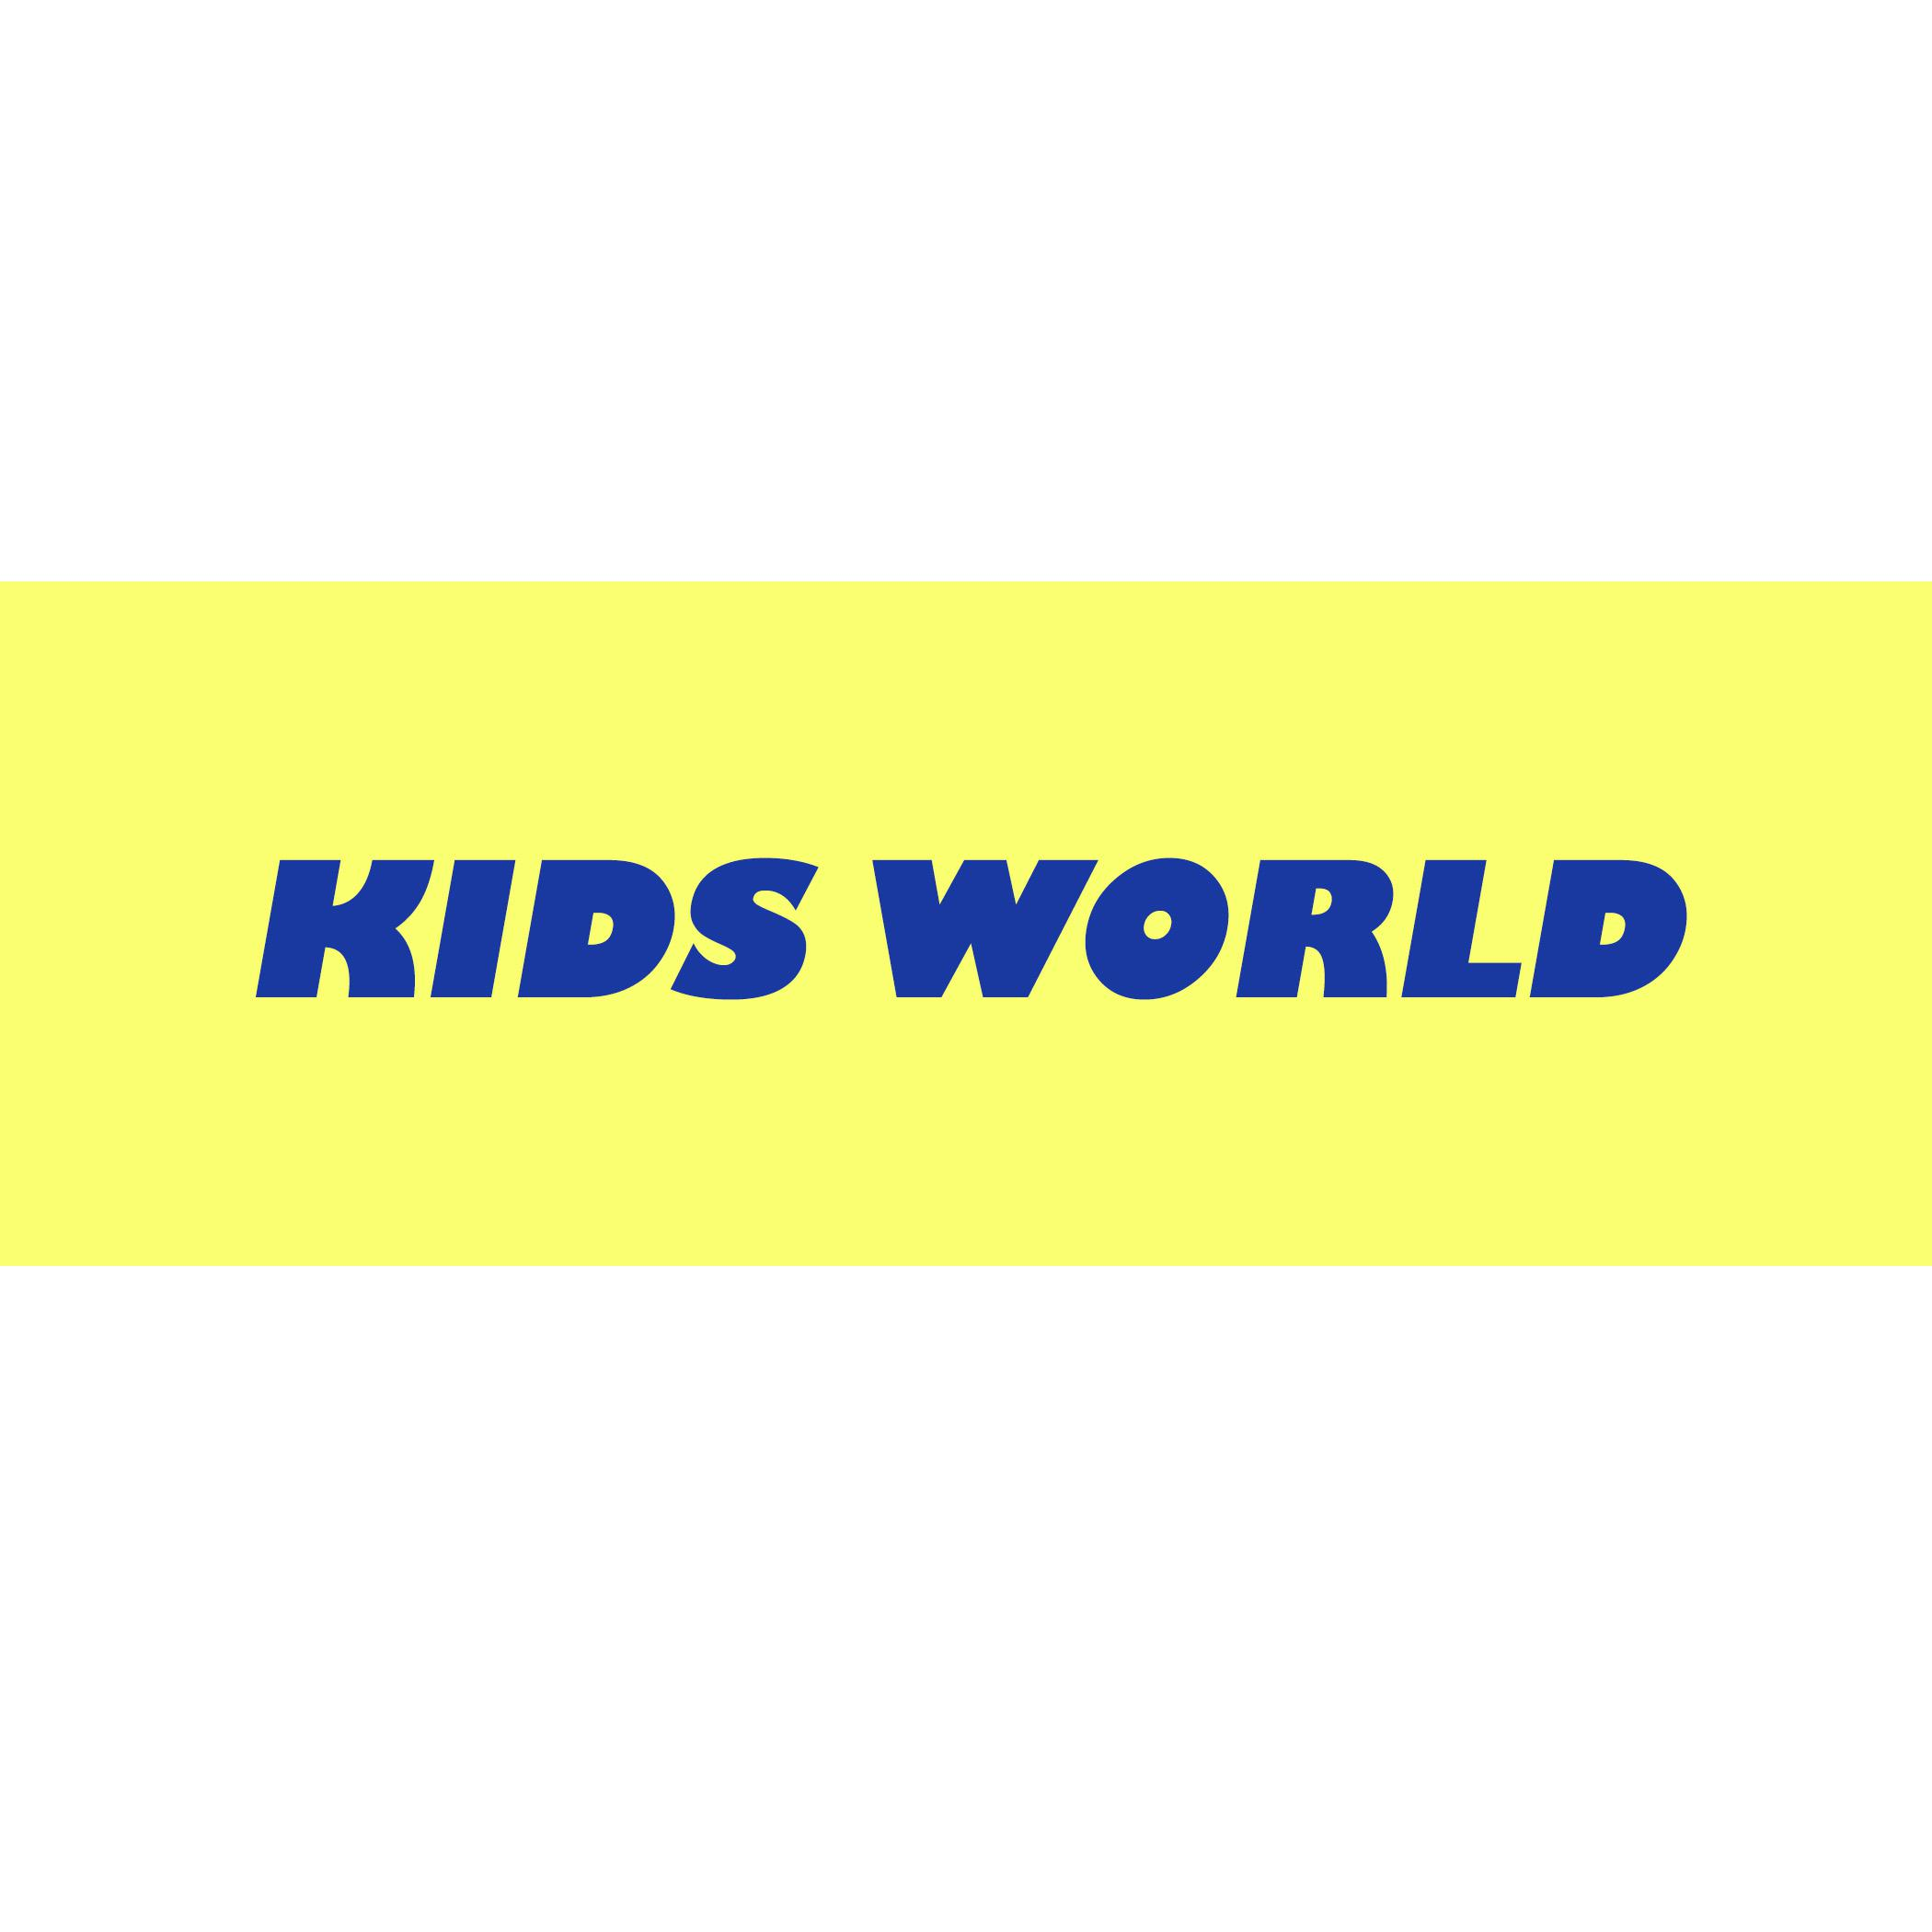 Kids World Playschool Nursery & LKG, Kids World Playschool Nursery & Lkg